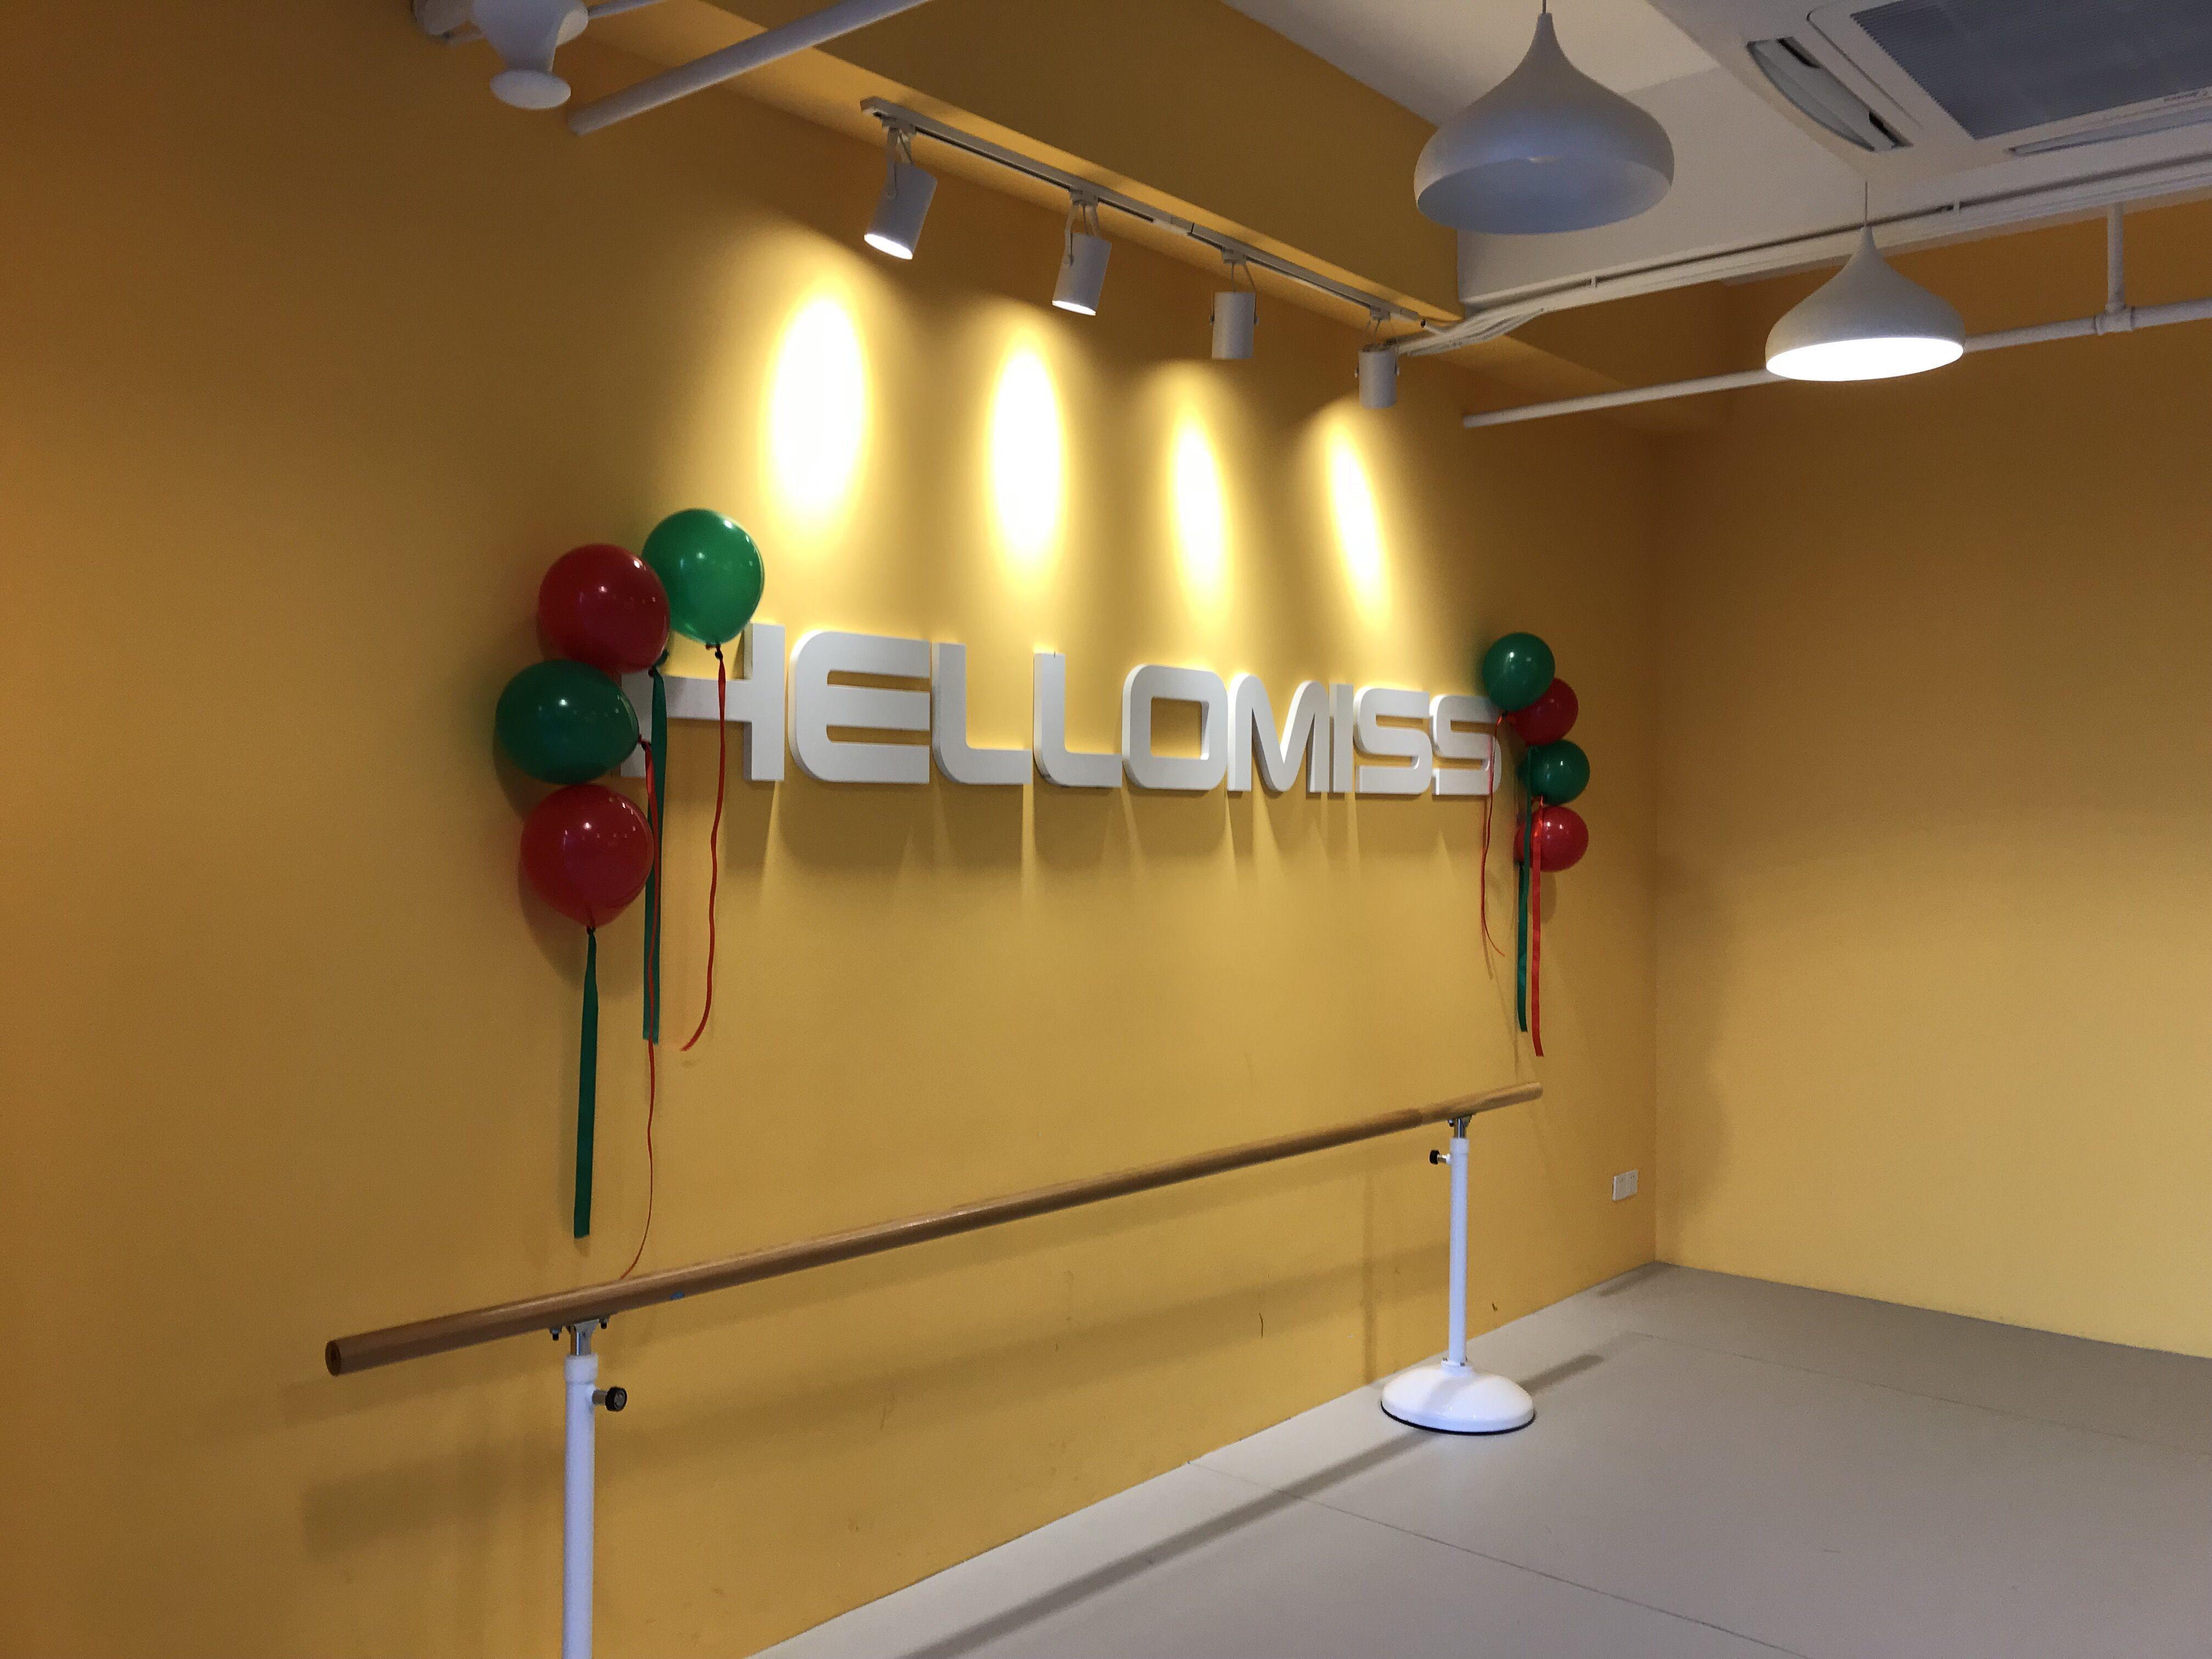 hellomiss舞蹈工作室